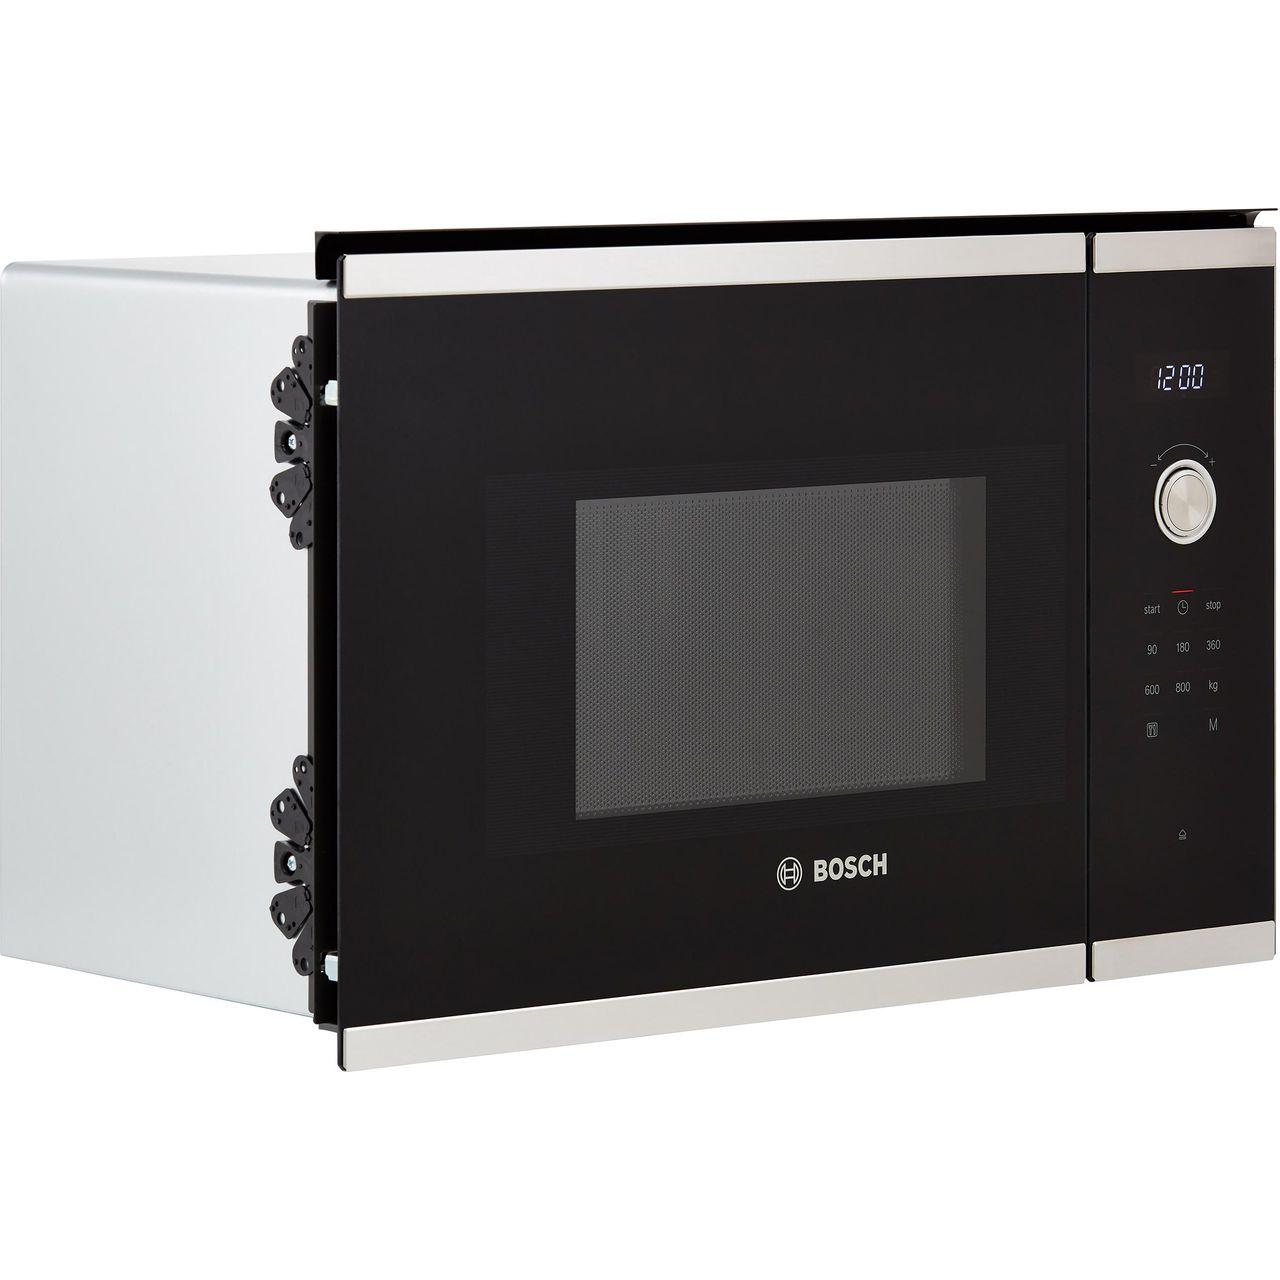 Bosch Built In Microwave